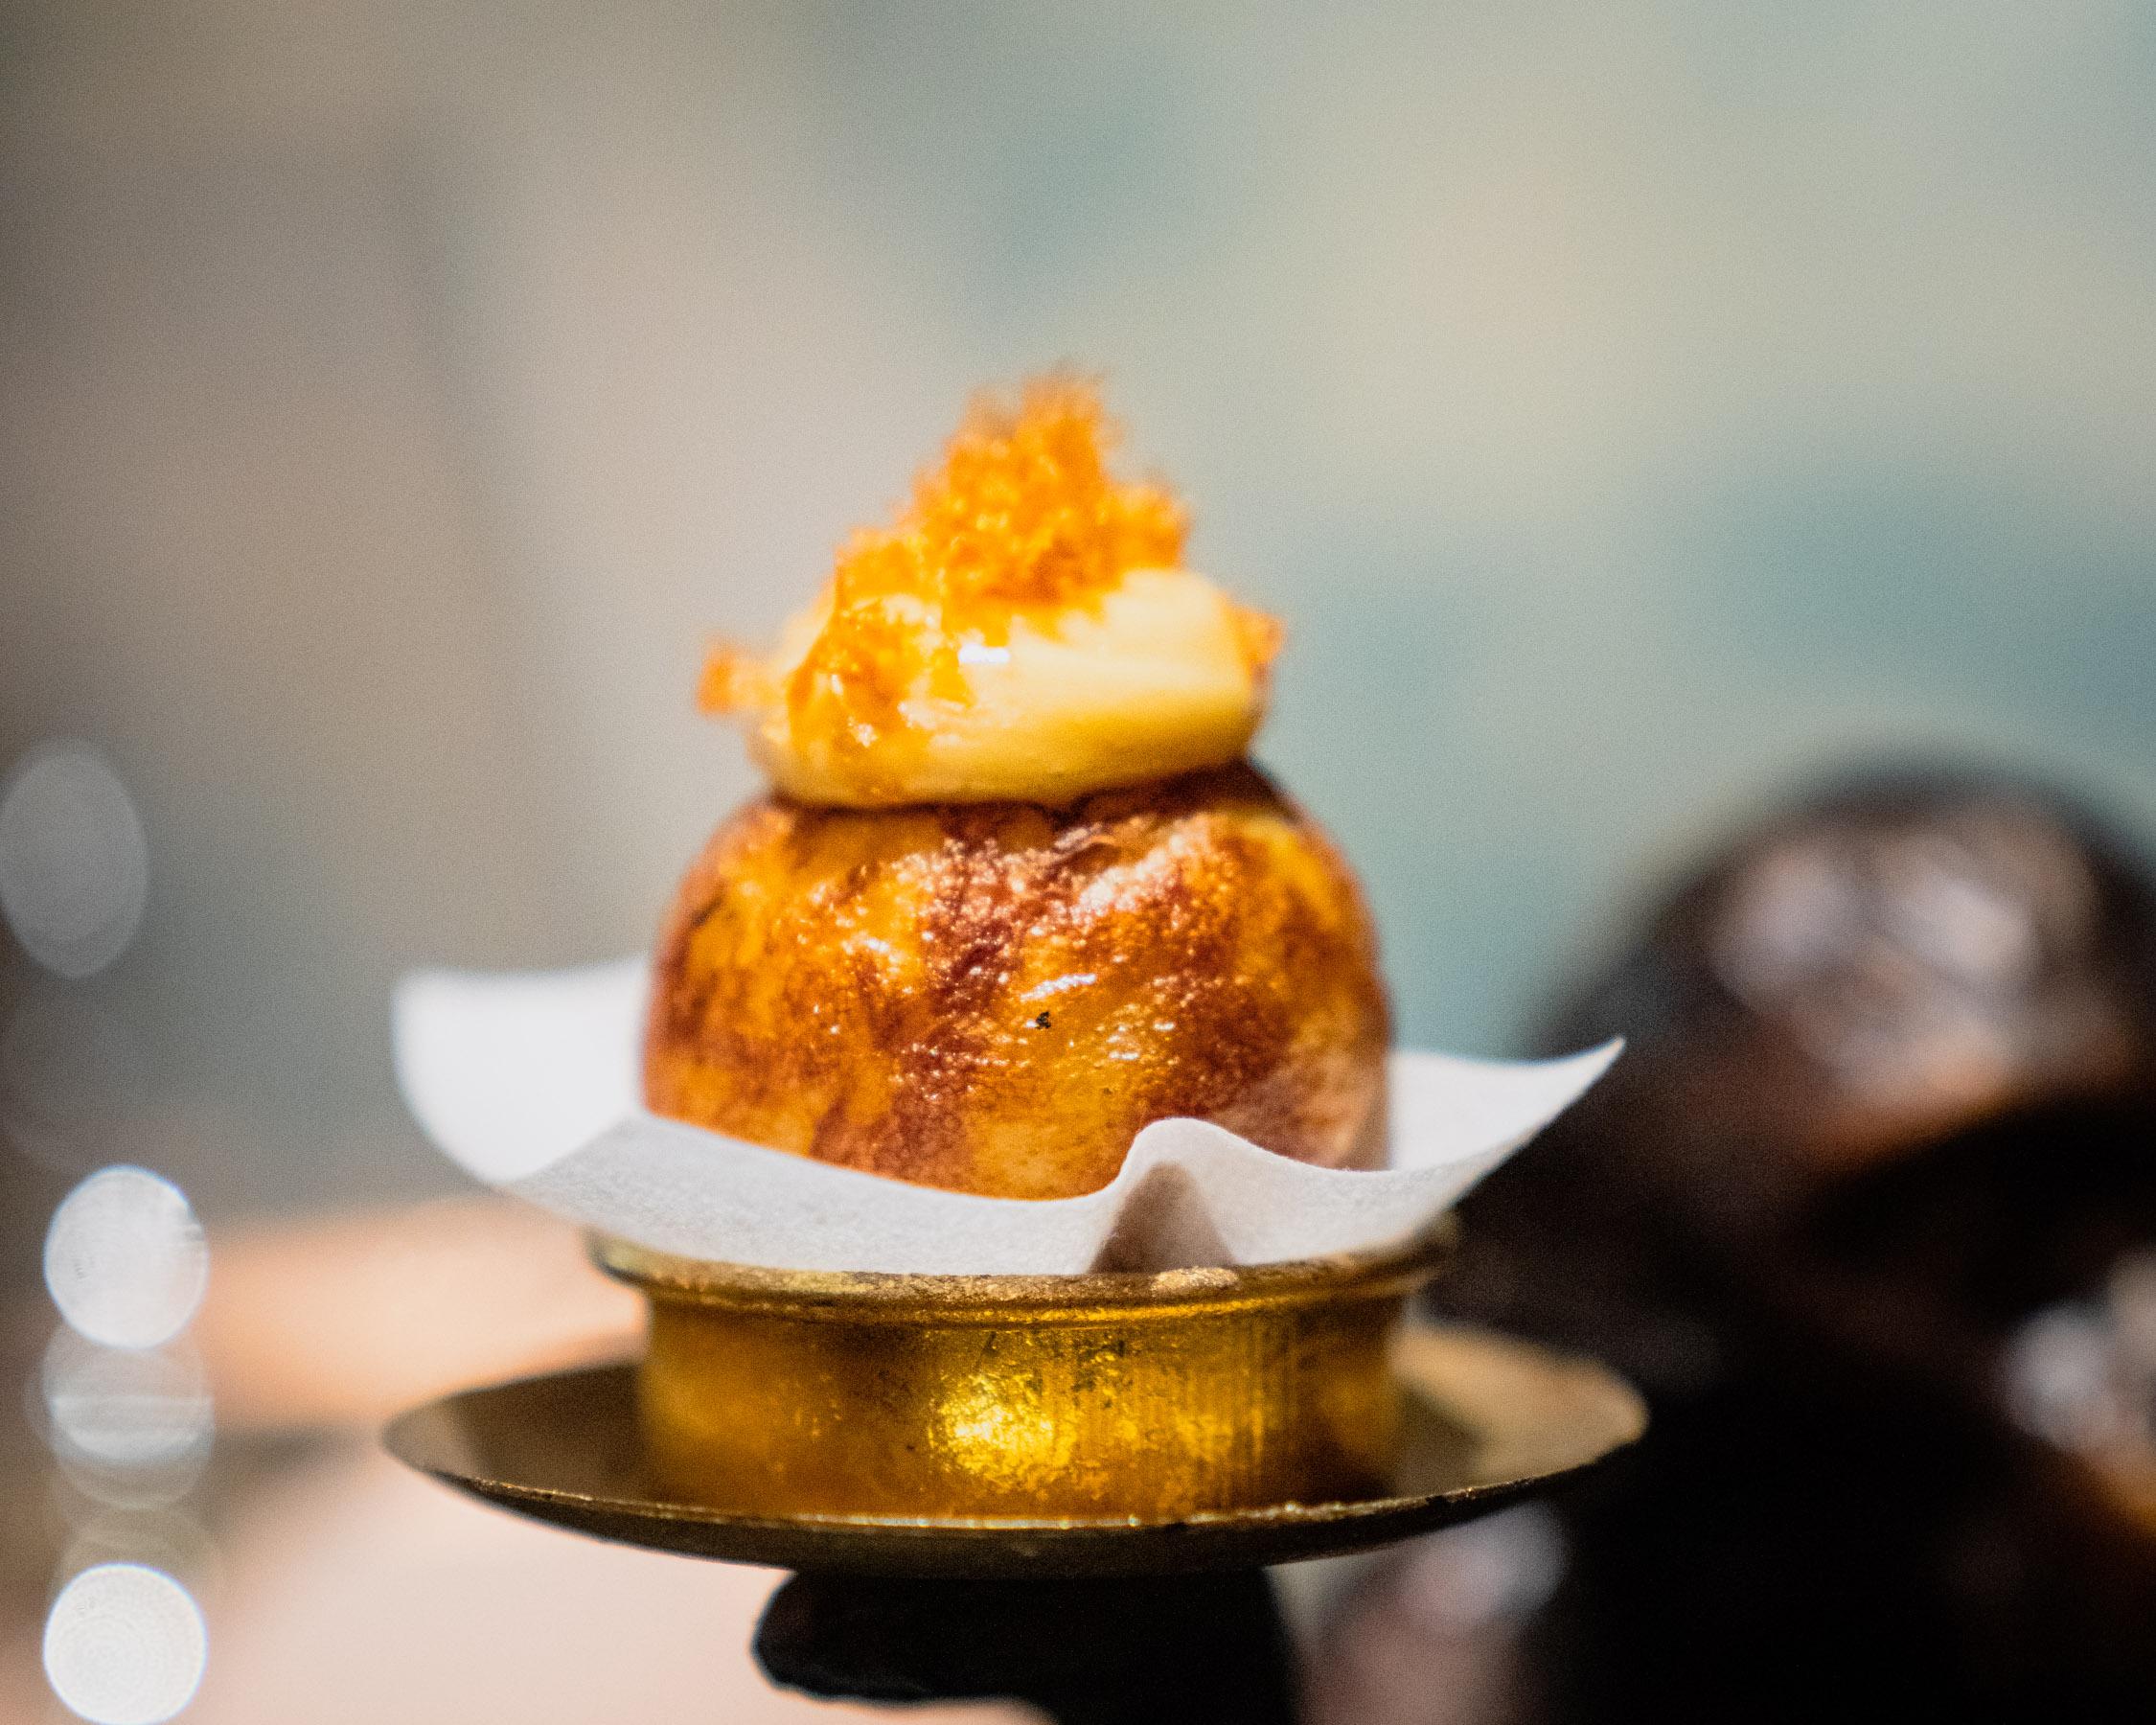 Æbleskiver with Buttered Dungeness Crab, Roasted Garlic & Pickled Jalapeño